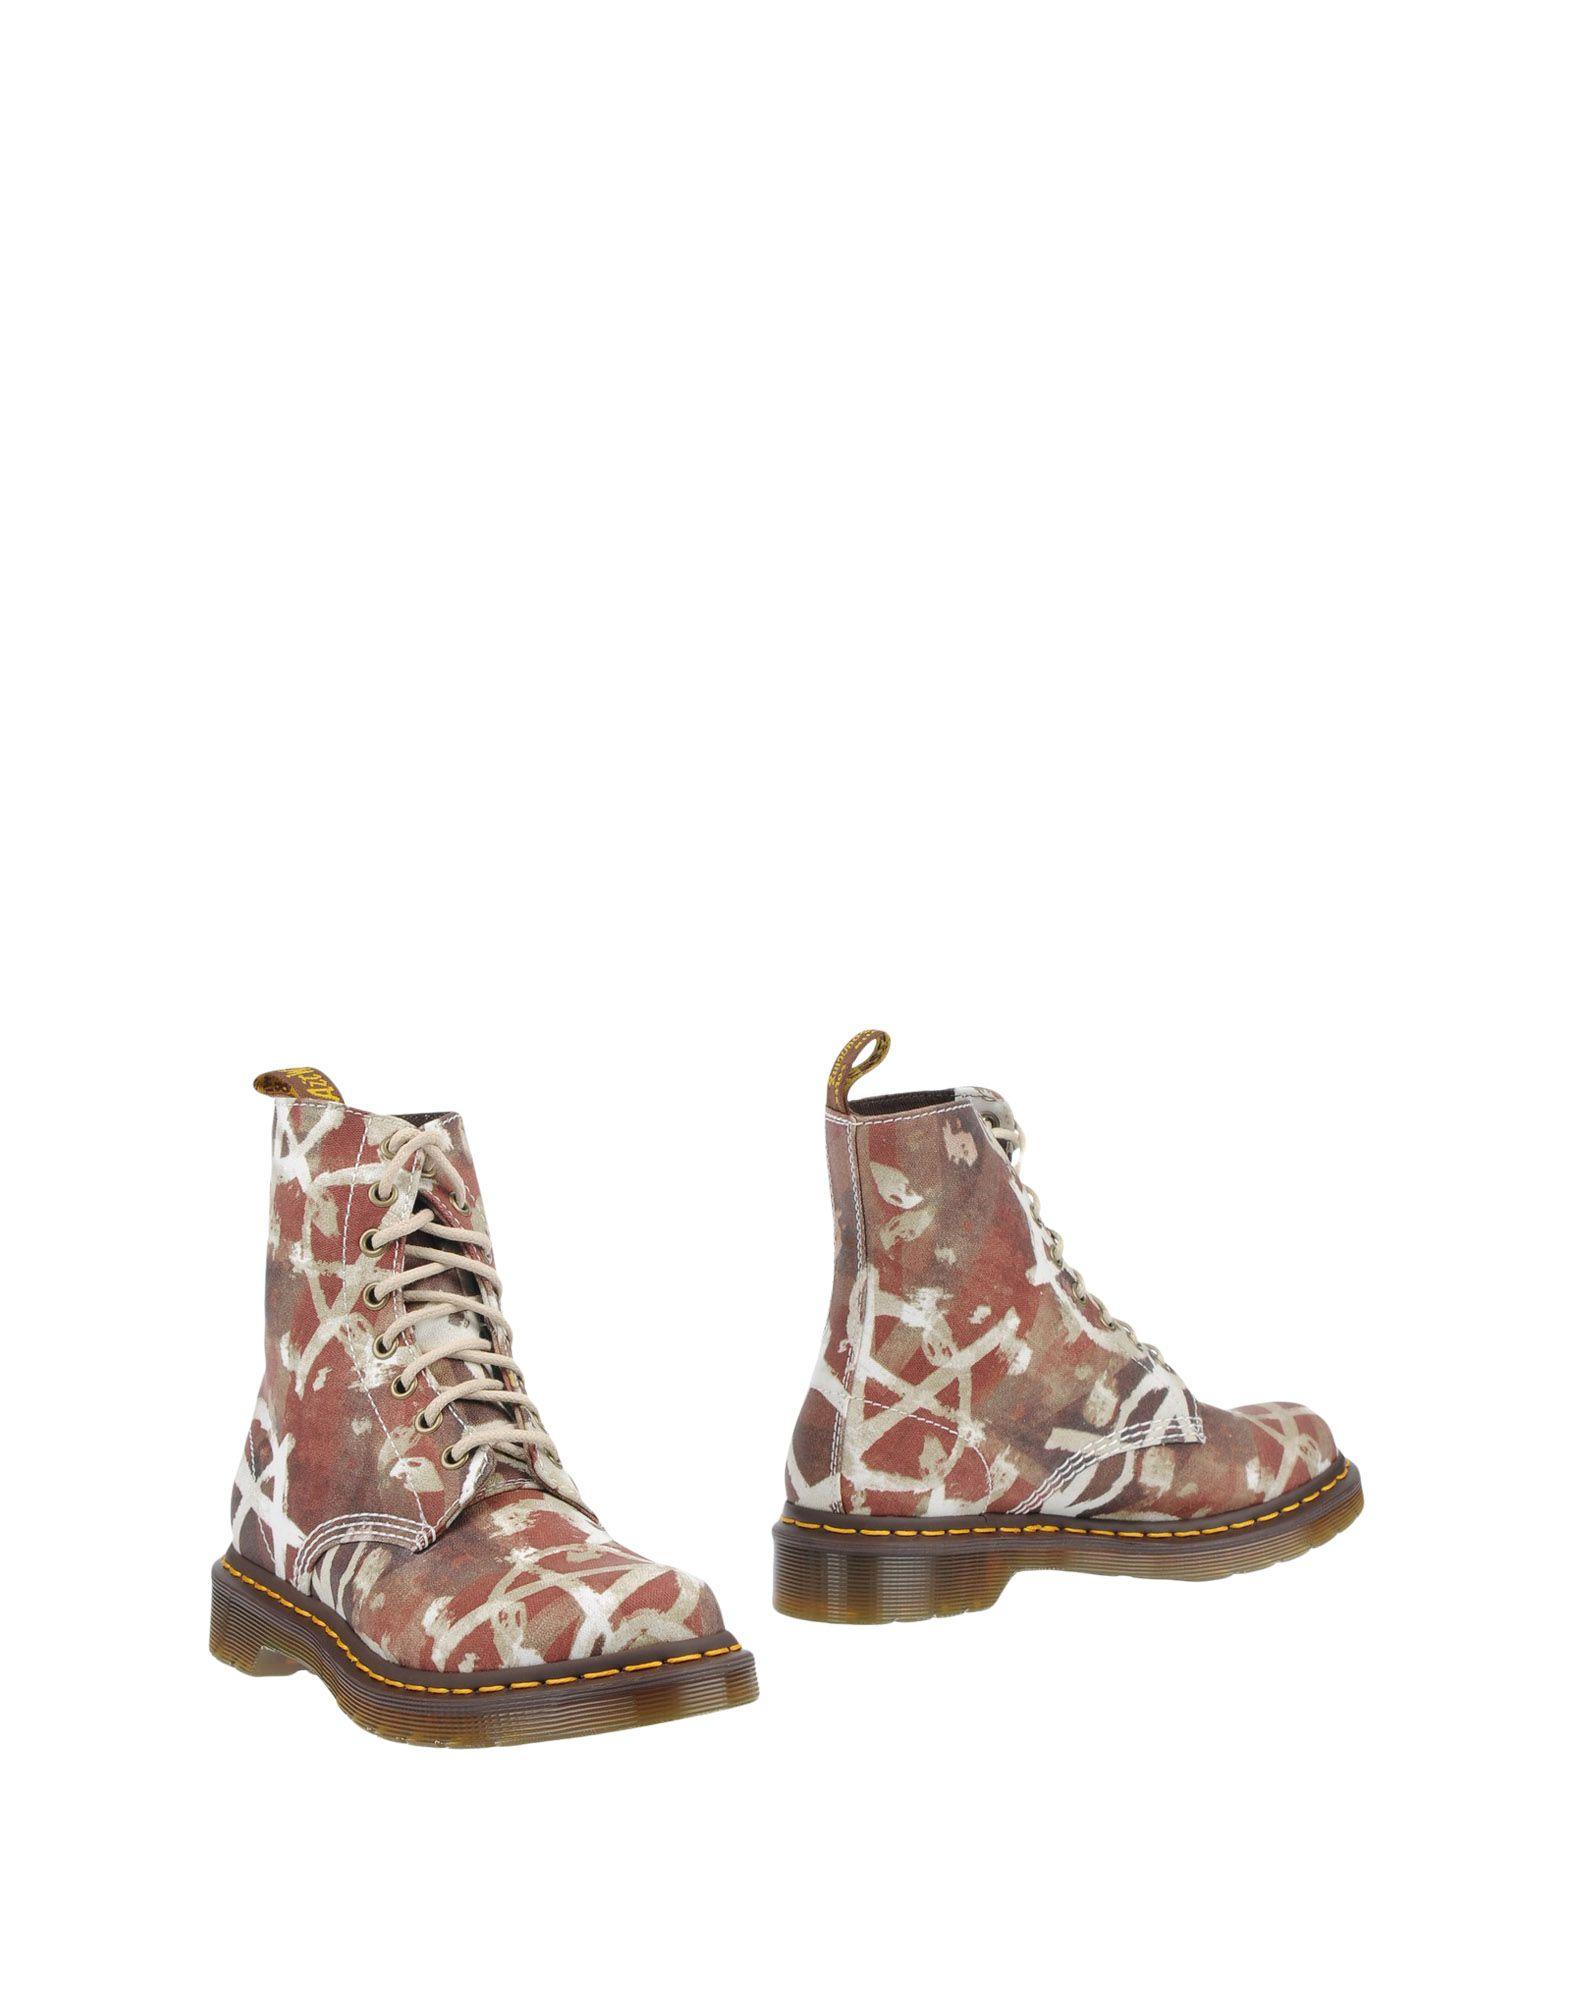 DR. MARTENS Полусапоги и высокие ботинки ботинки женские dr martens 1460 pascal цвет синий 13512410 размер 4 37